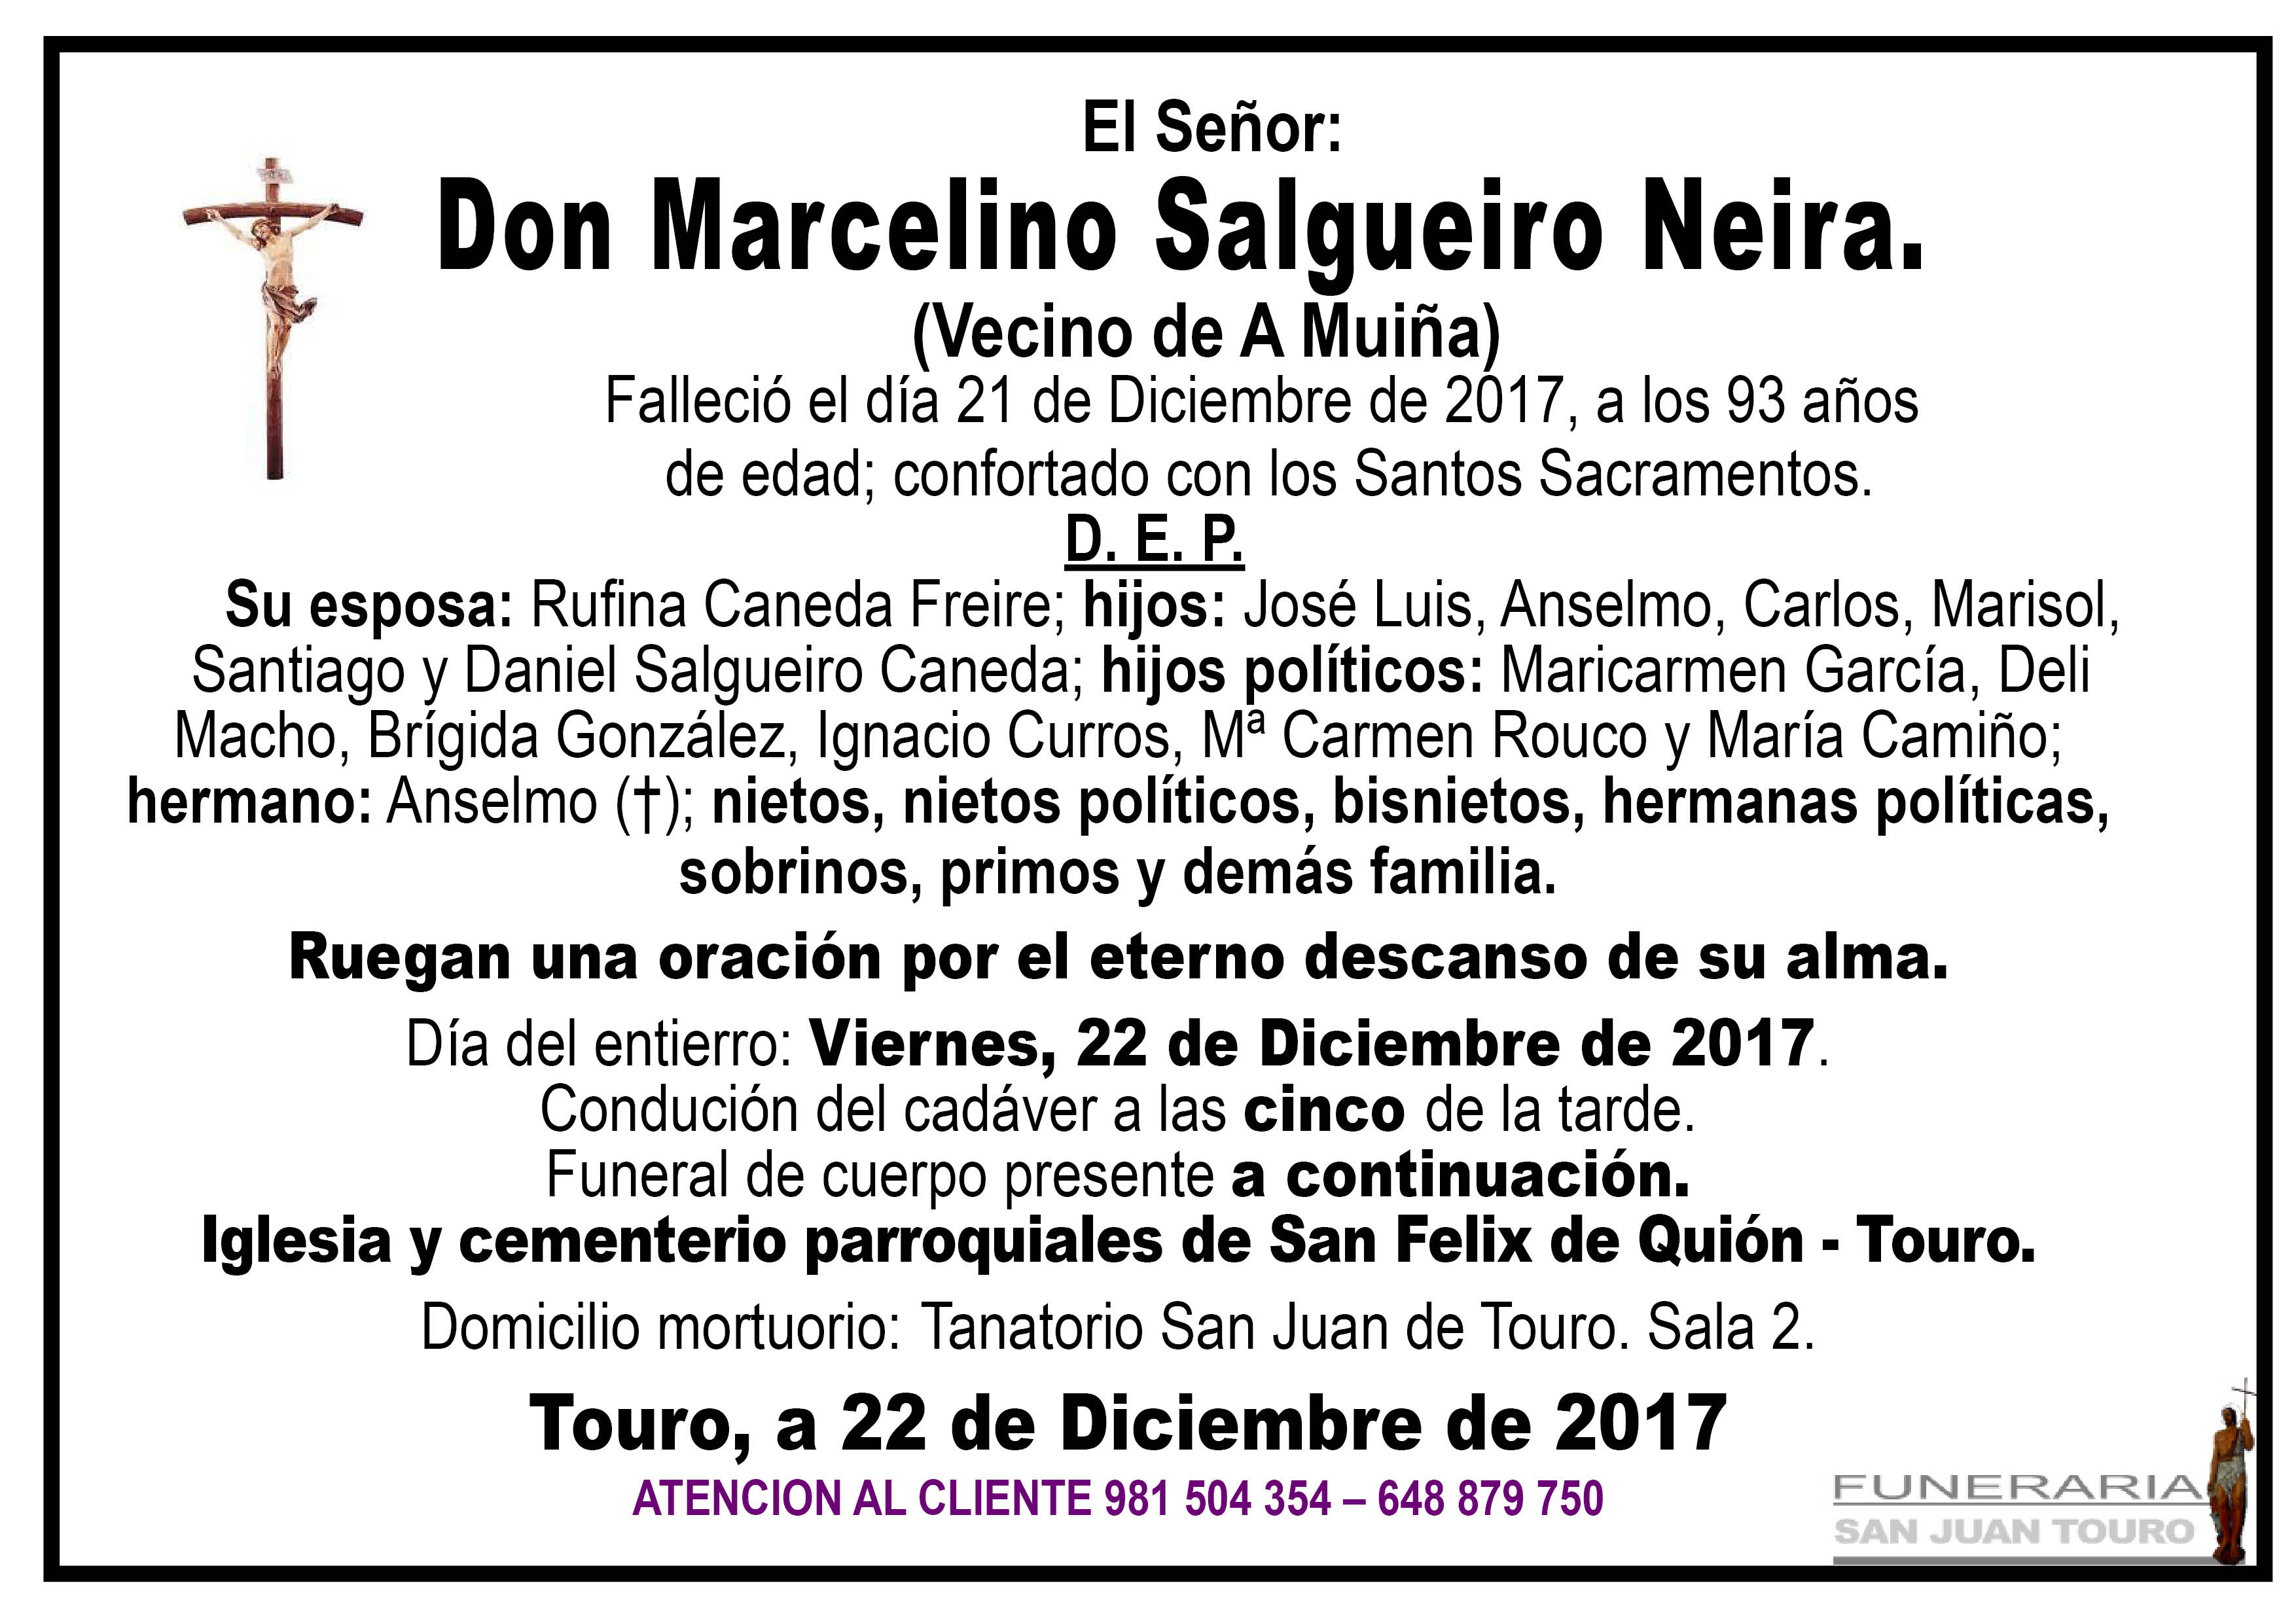 Esquela de SEPELIO DE D. MARCELINO SALGUEIRO NEIRA